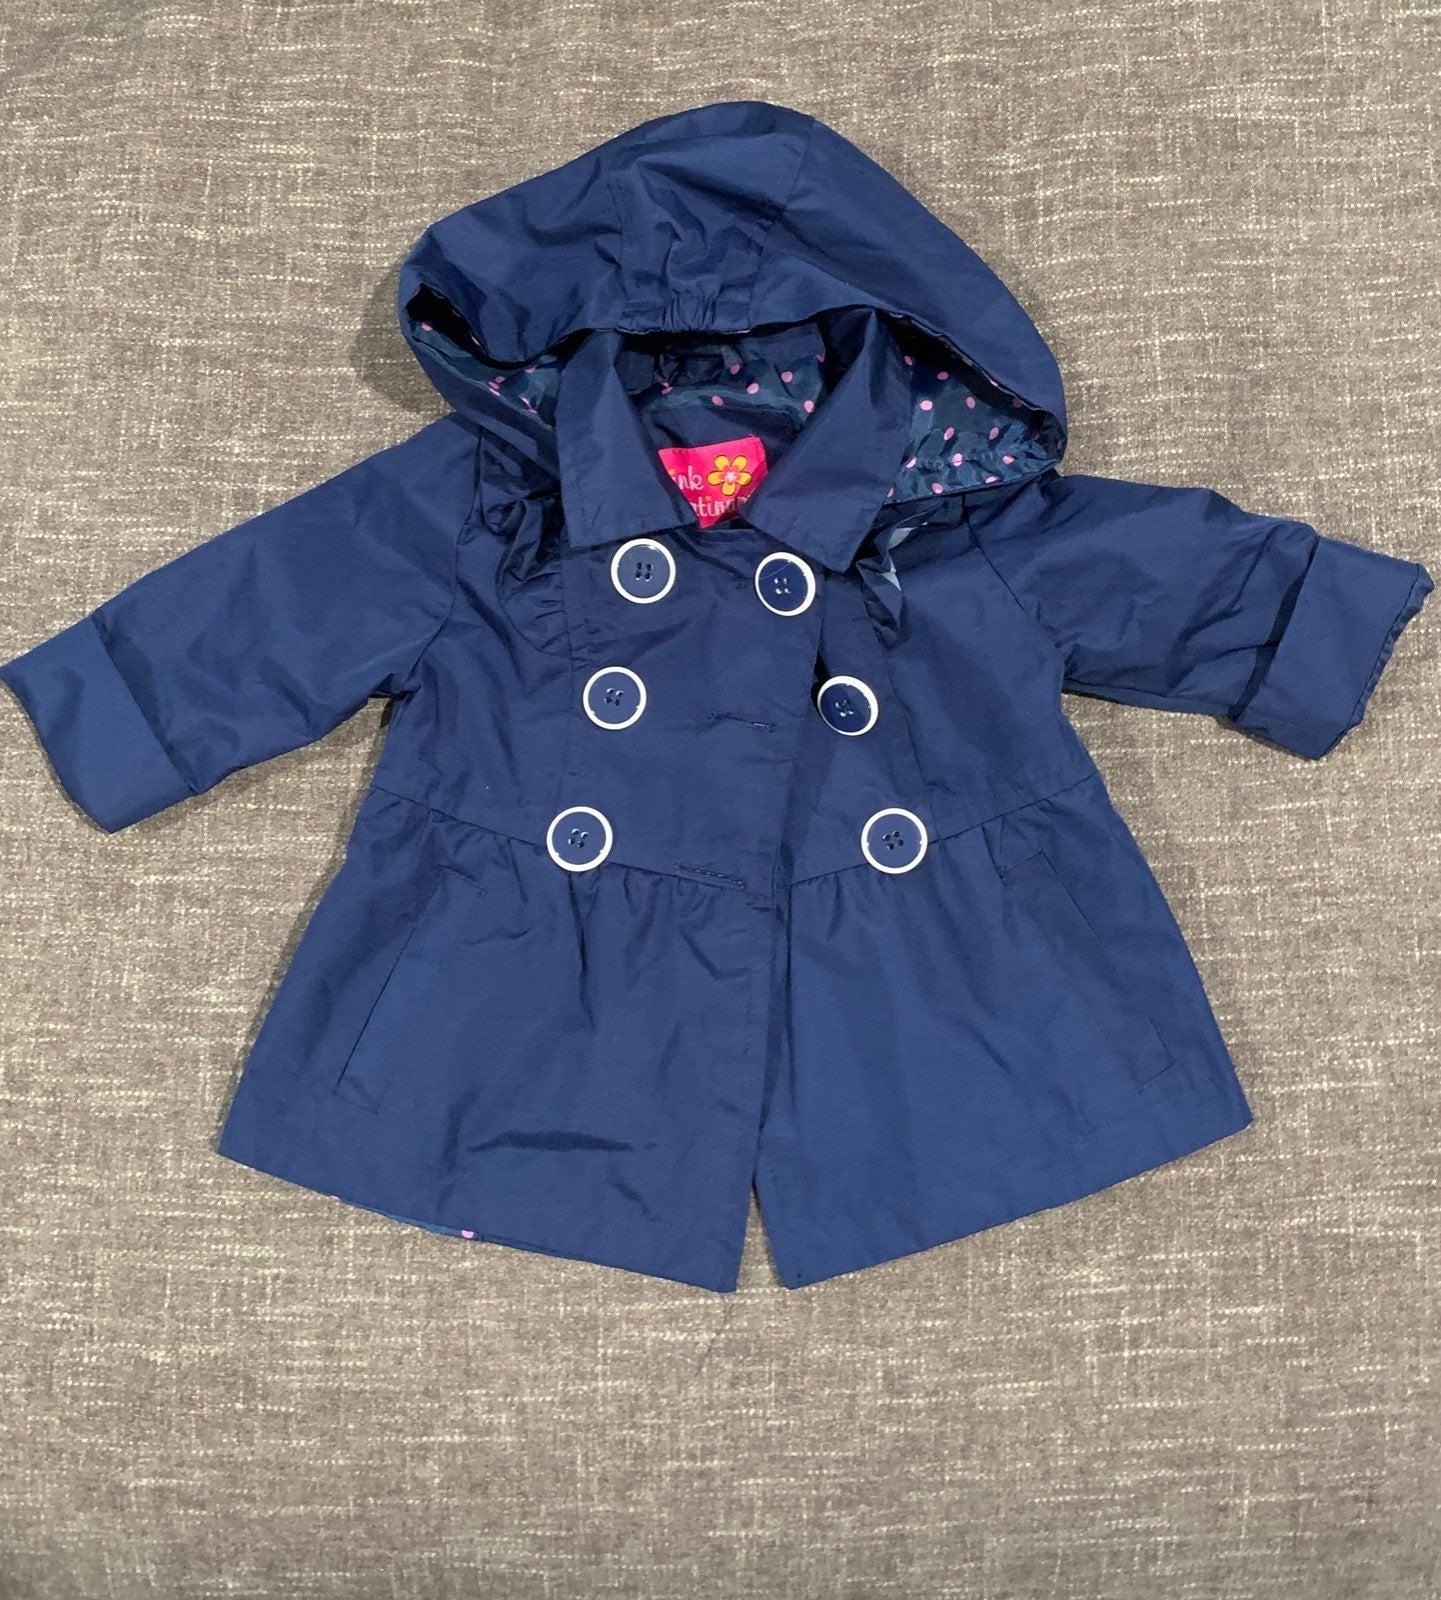 Toddler Light Jacket